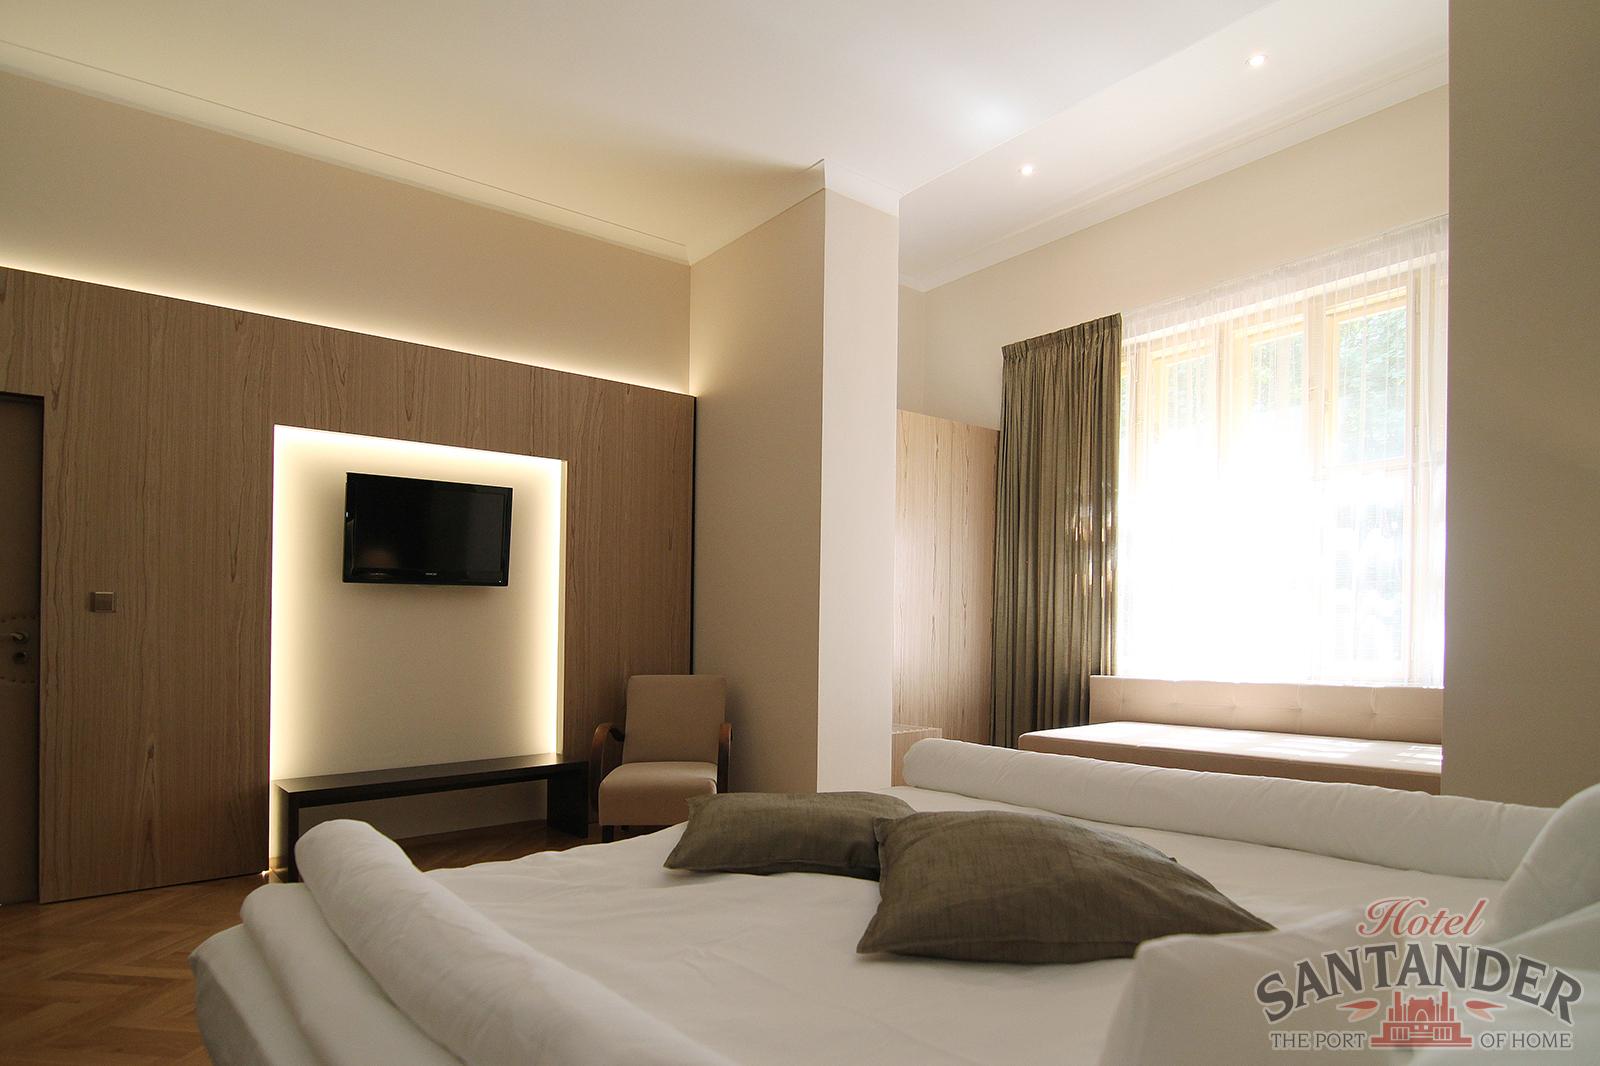 Superior hotel santander brno for Superior hotel